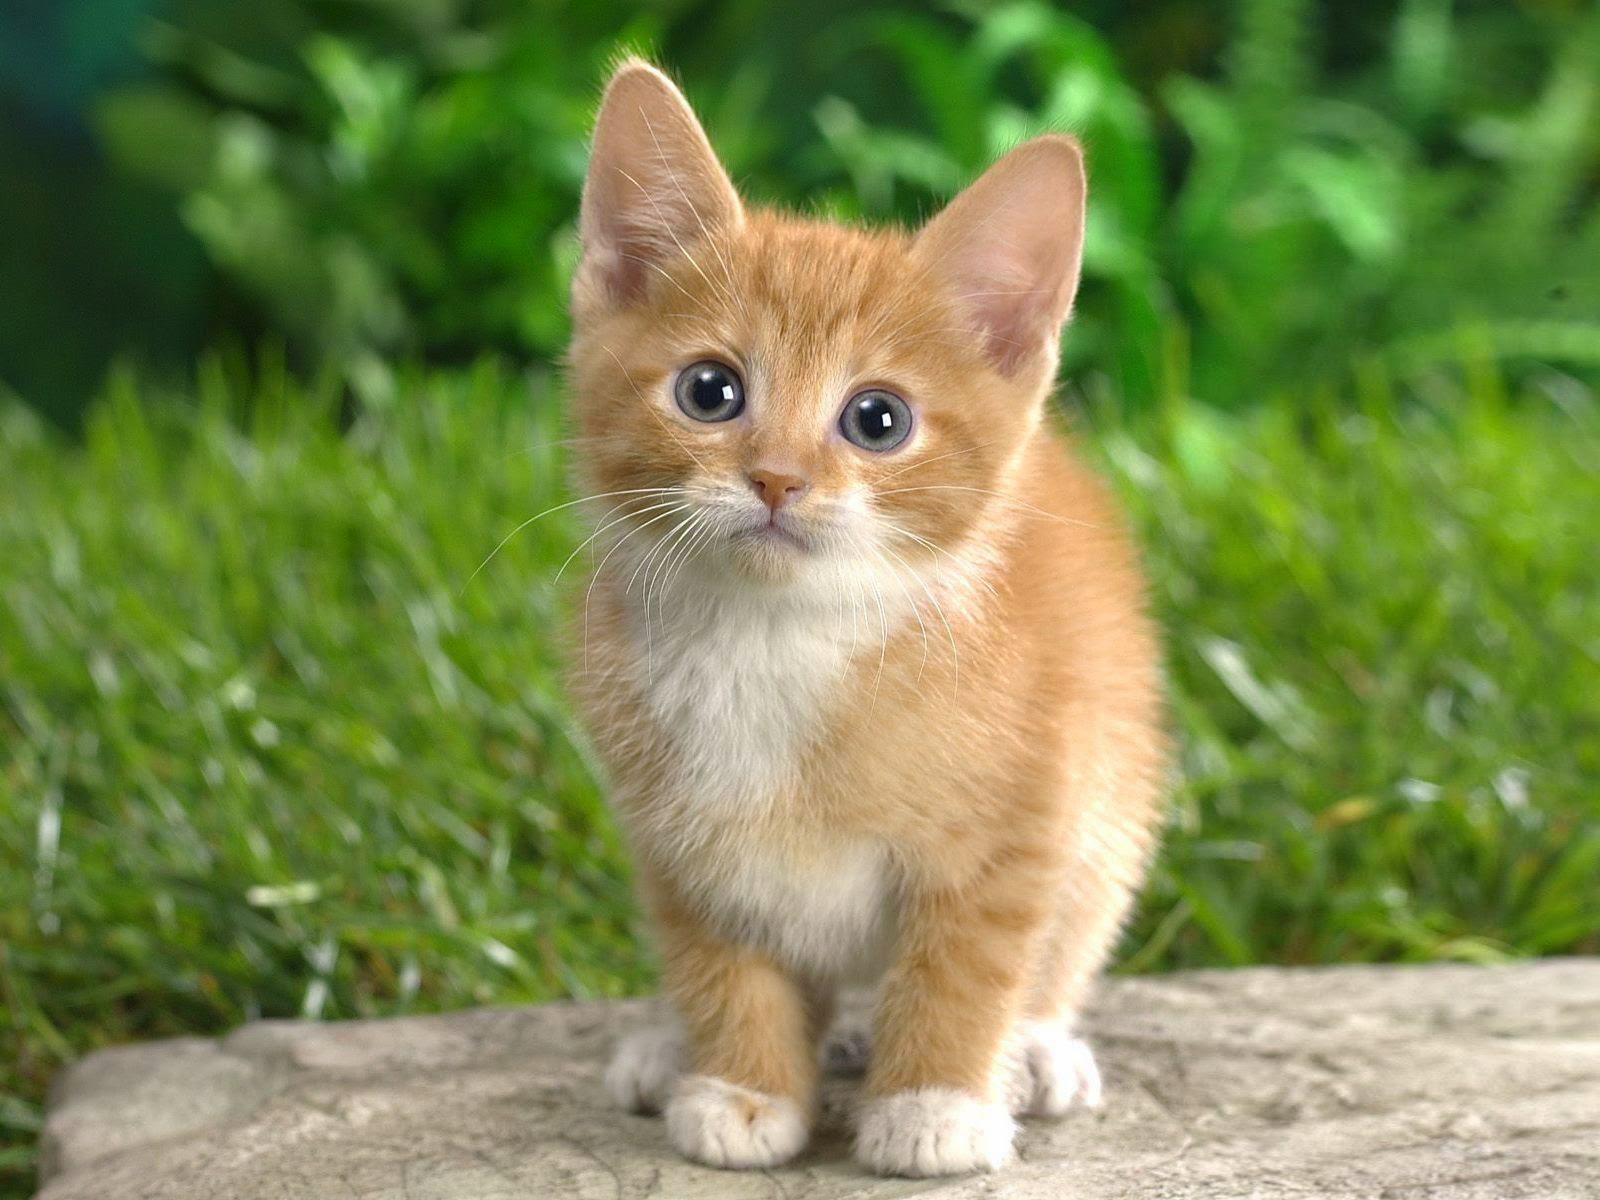 Pinkerellie s Blog The cutest kittens ever